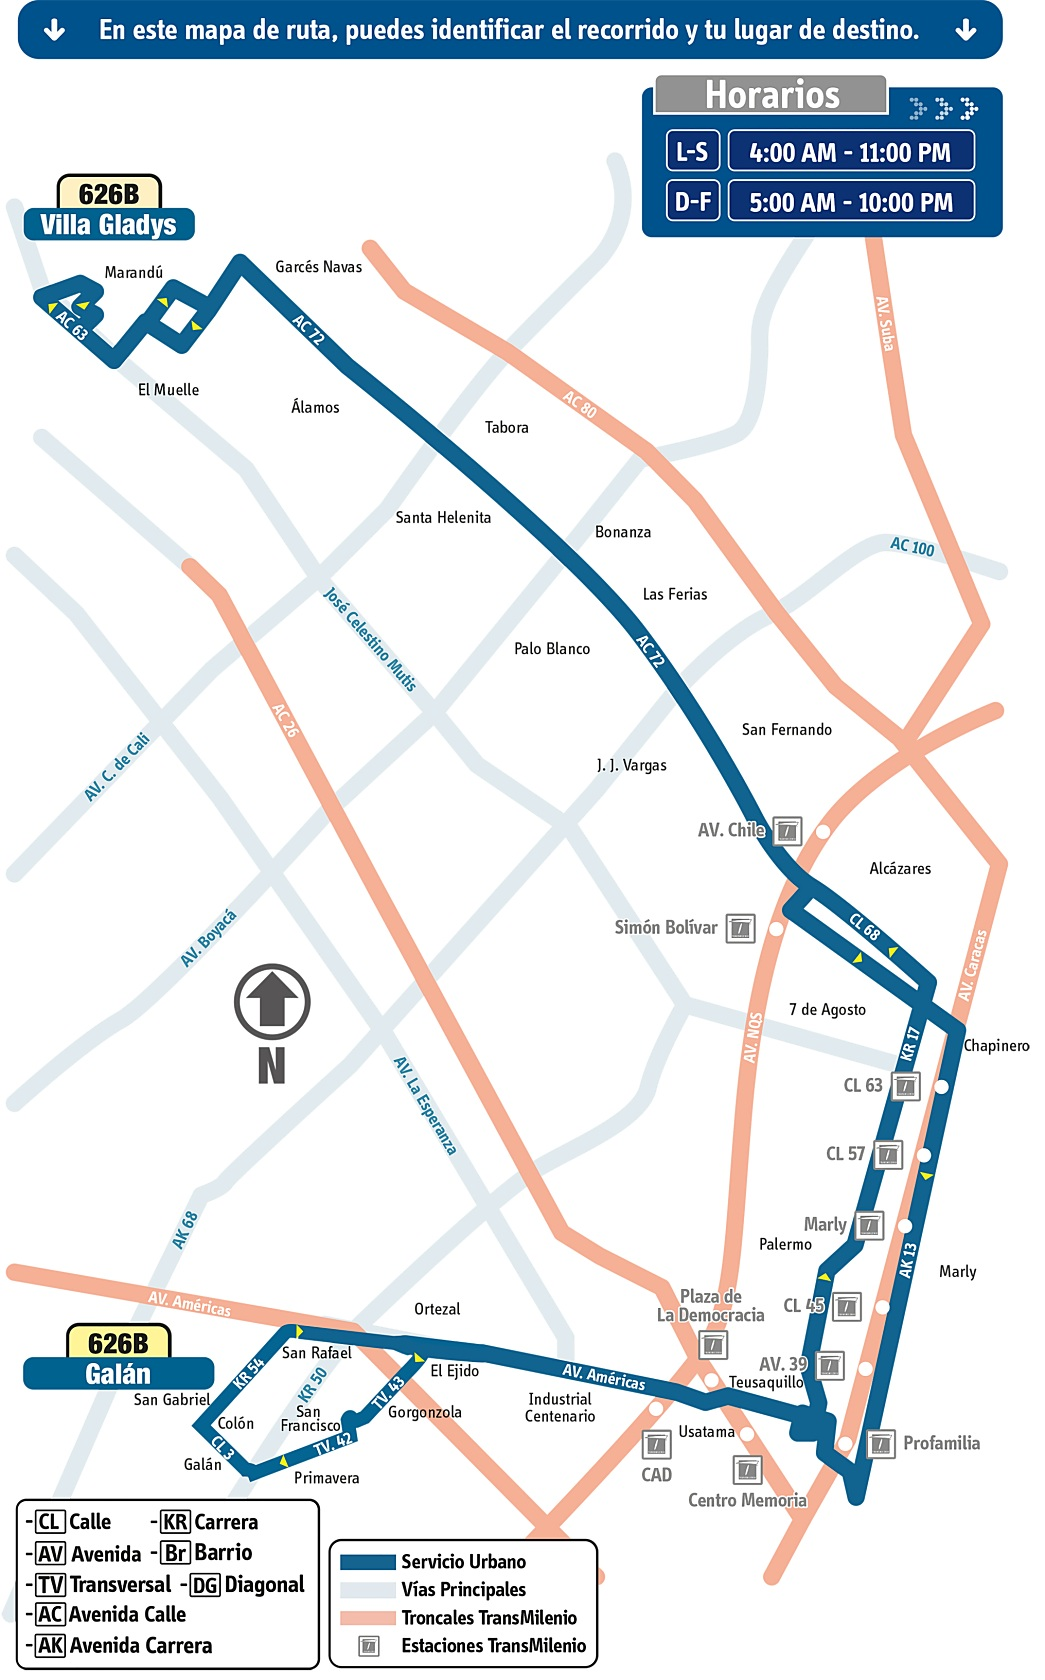 El 27 de abril se extiende la ruta urbana 626B Villa Gladys - Galán 1